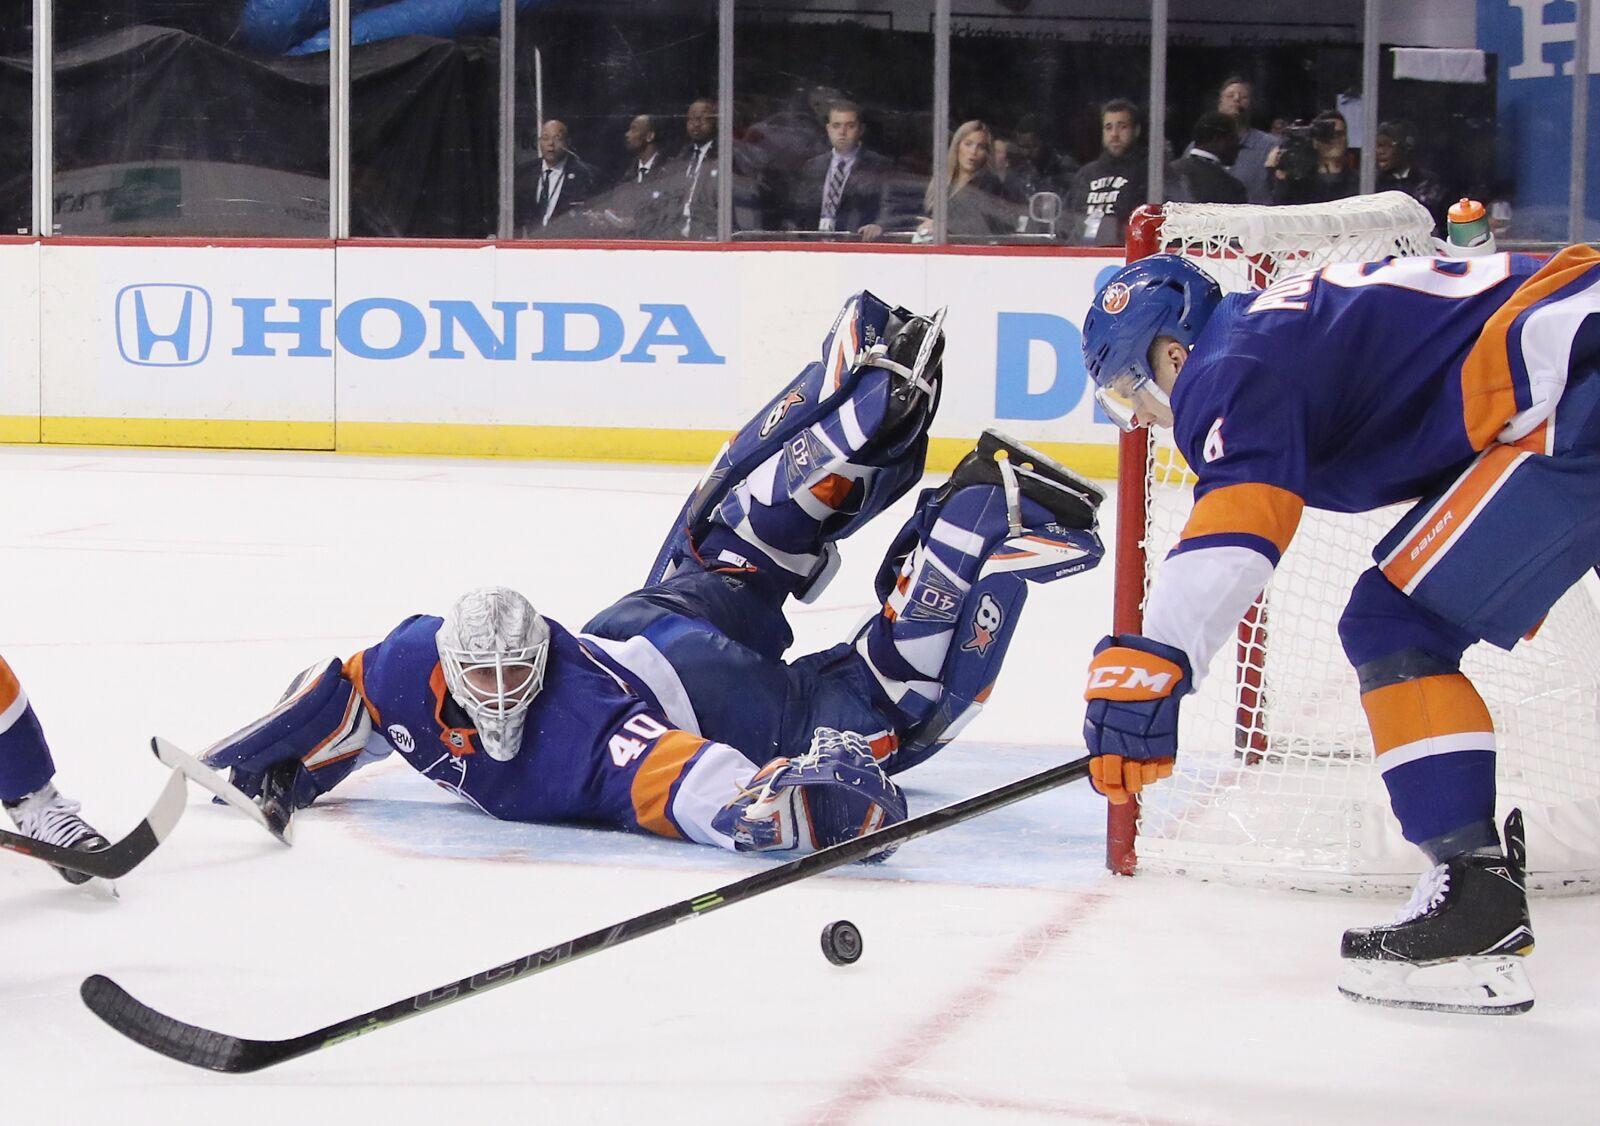 New York Islanders: The 'mind-blowing' correlation between this season and last season